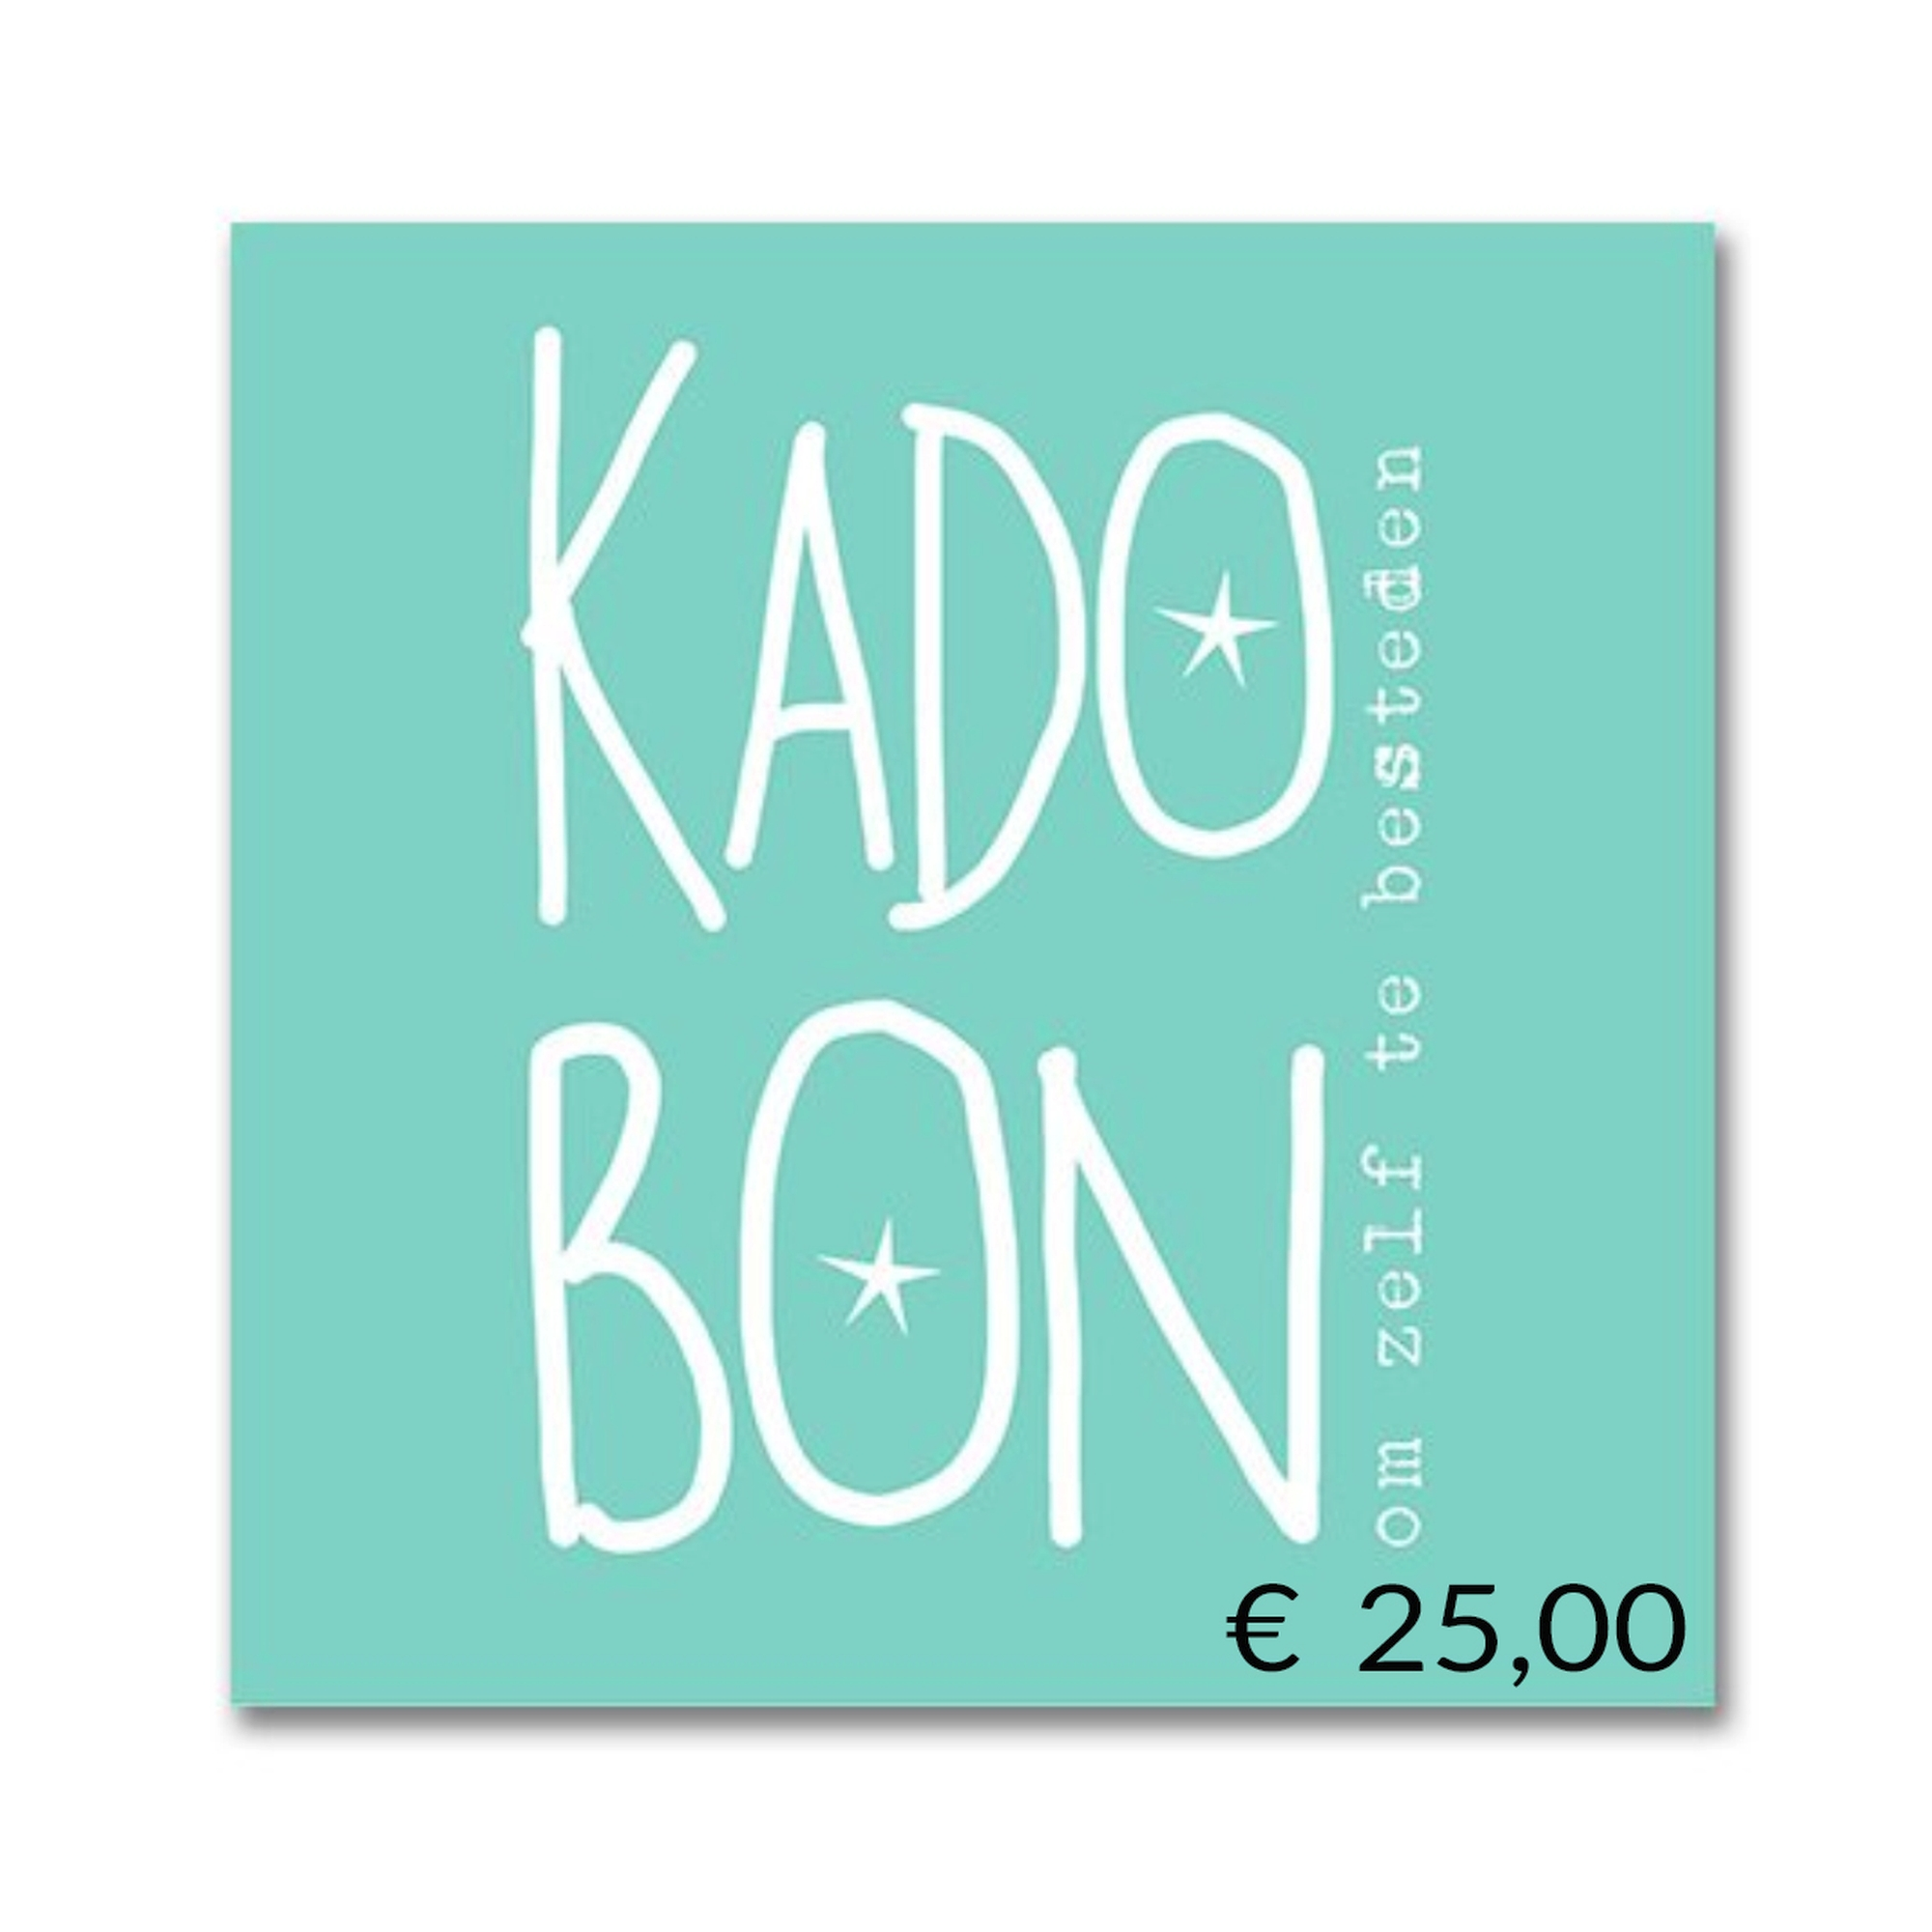 Steenwijk Schoenmode Kadobon Eur 25,00